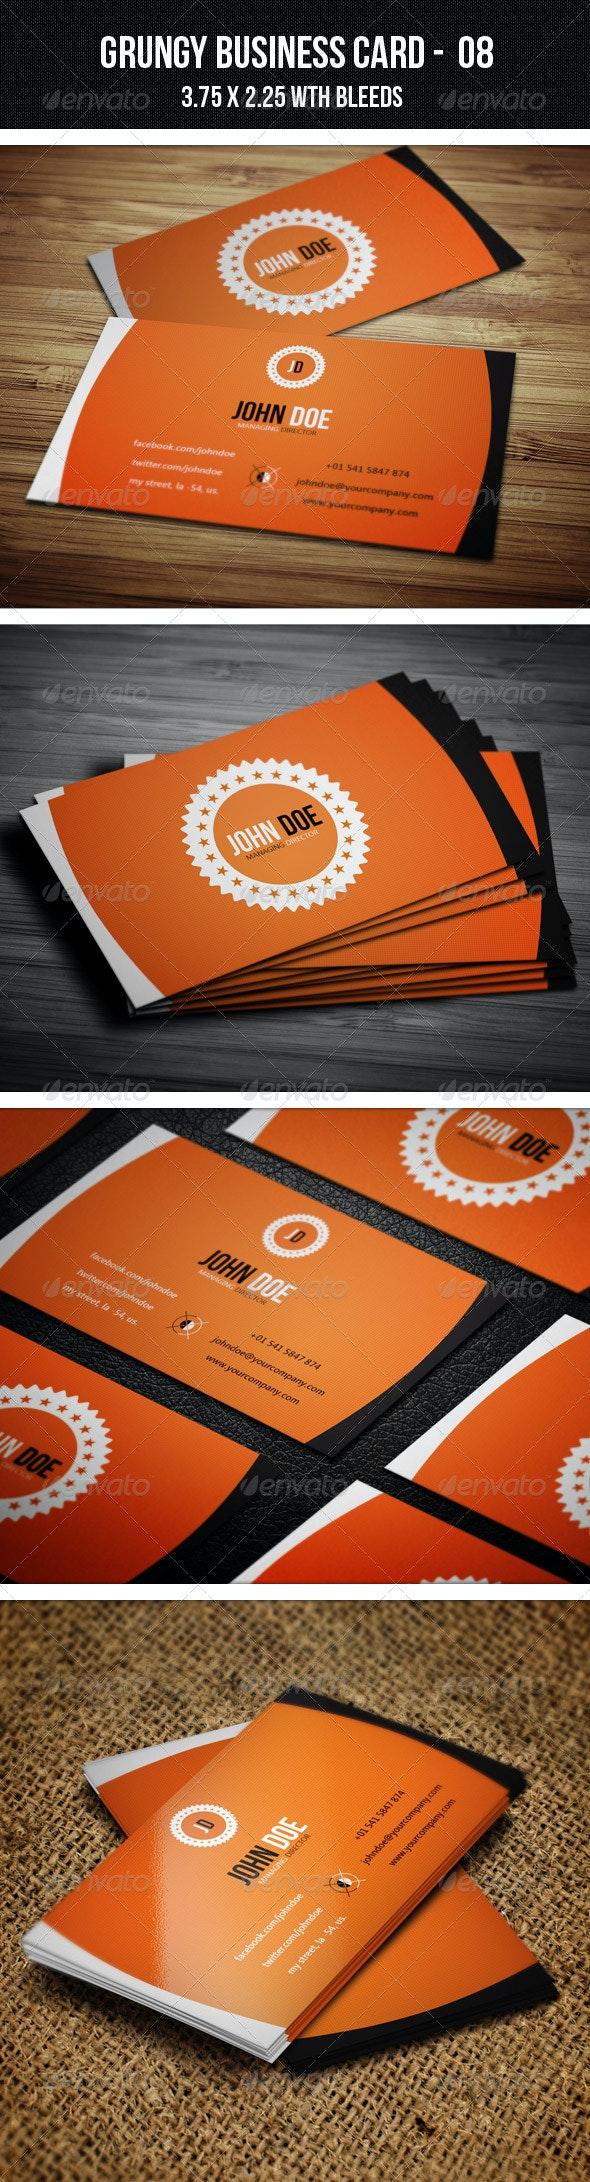 Creative Business Card - 08 - Creative Business Cards